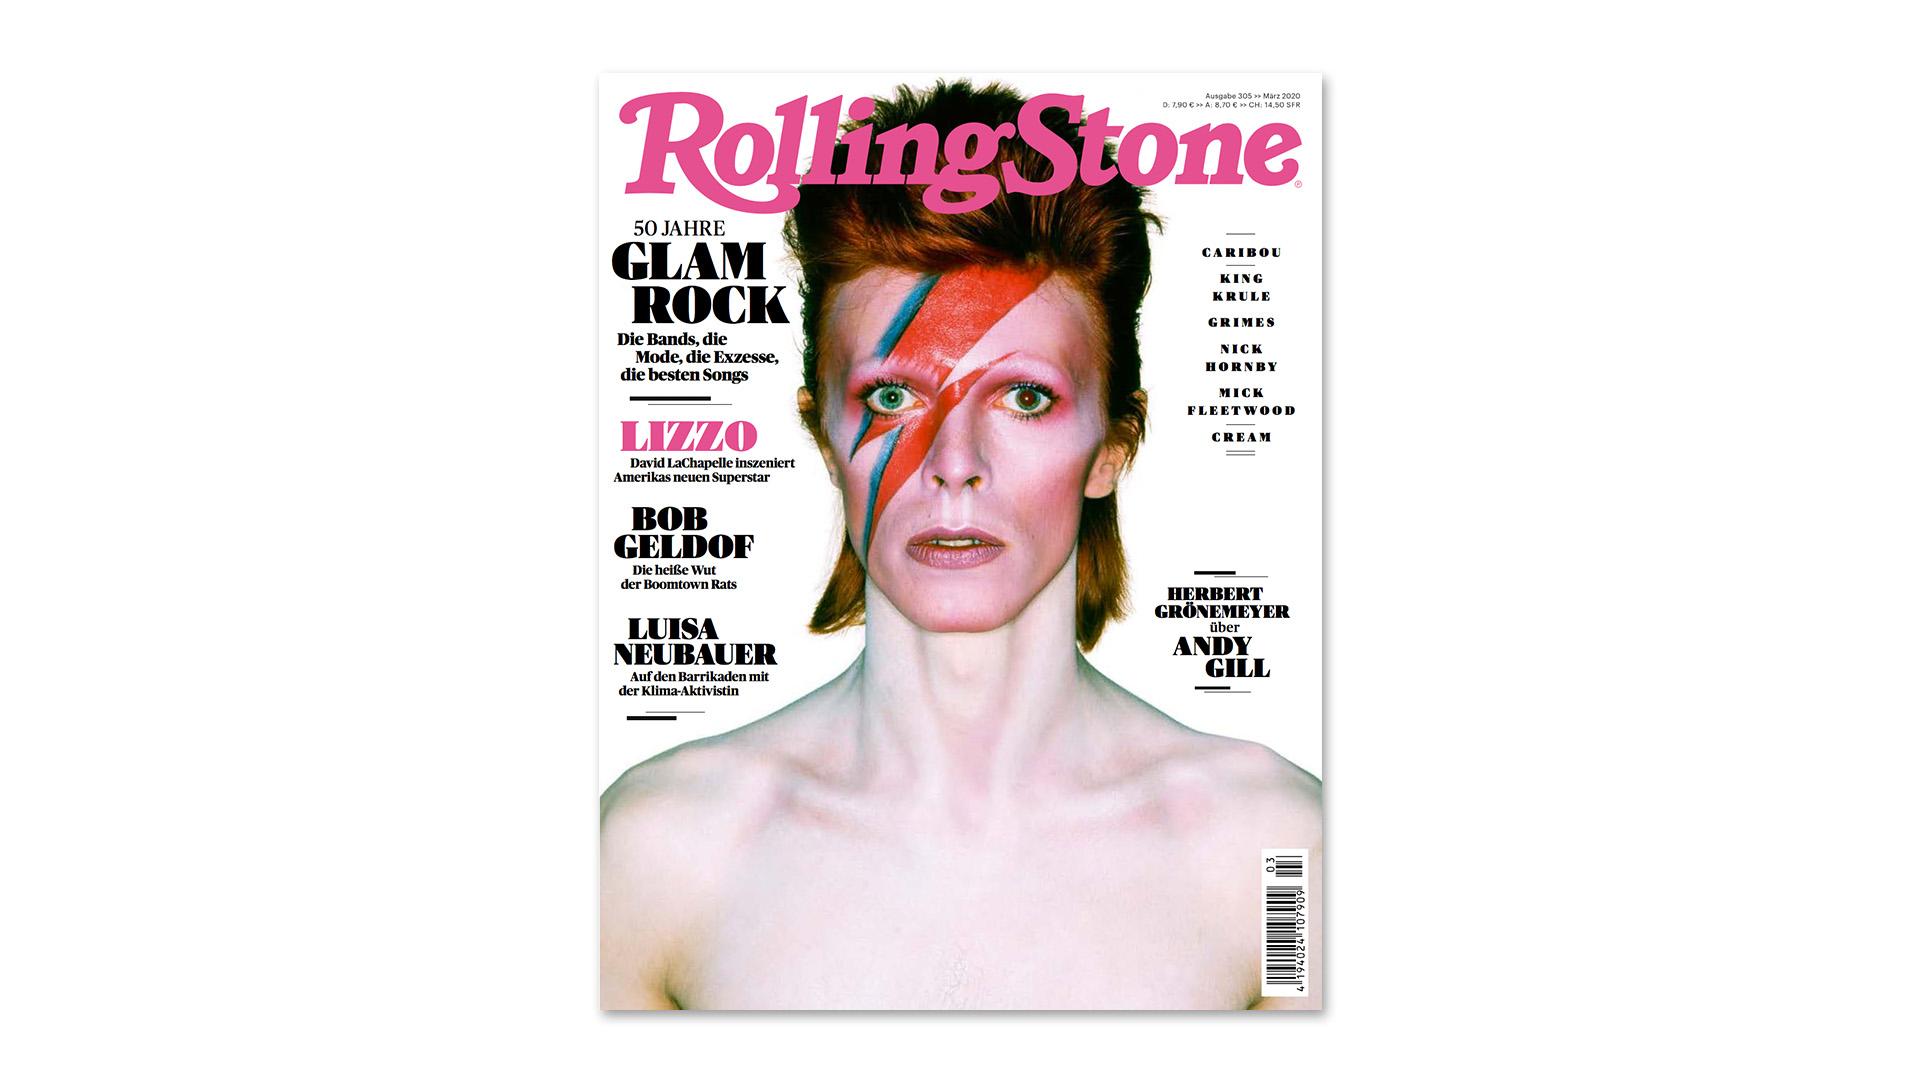 ROLLING STONE im März 2020 – Titelthema: Glamrock